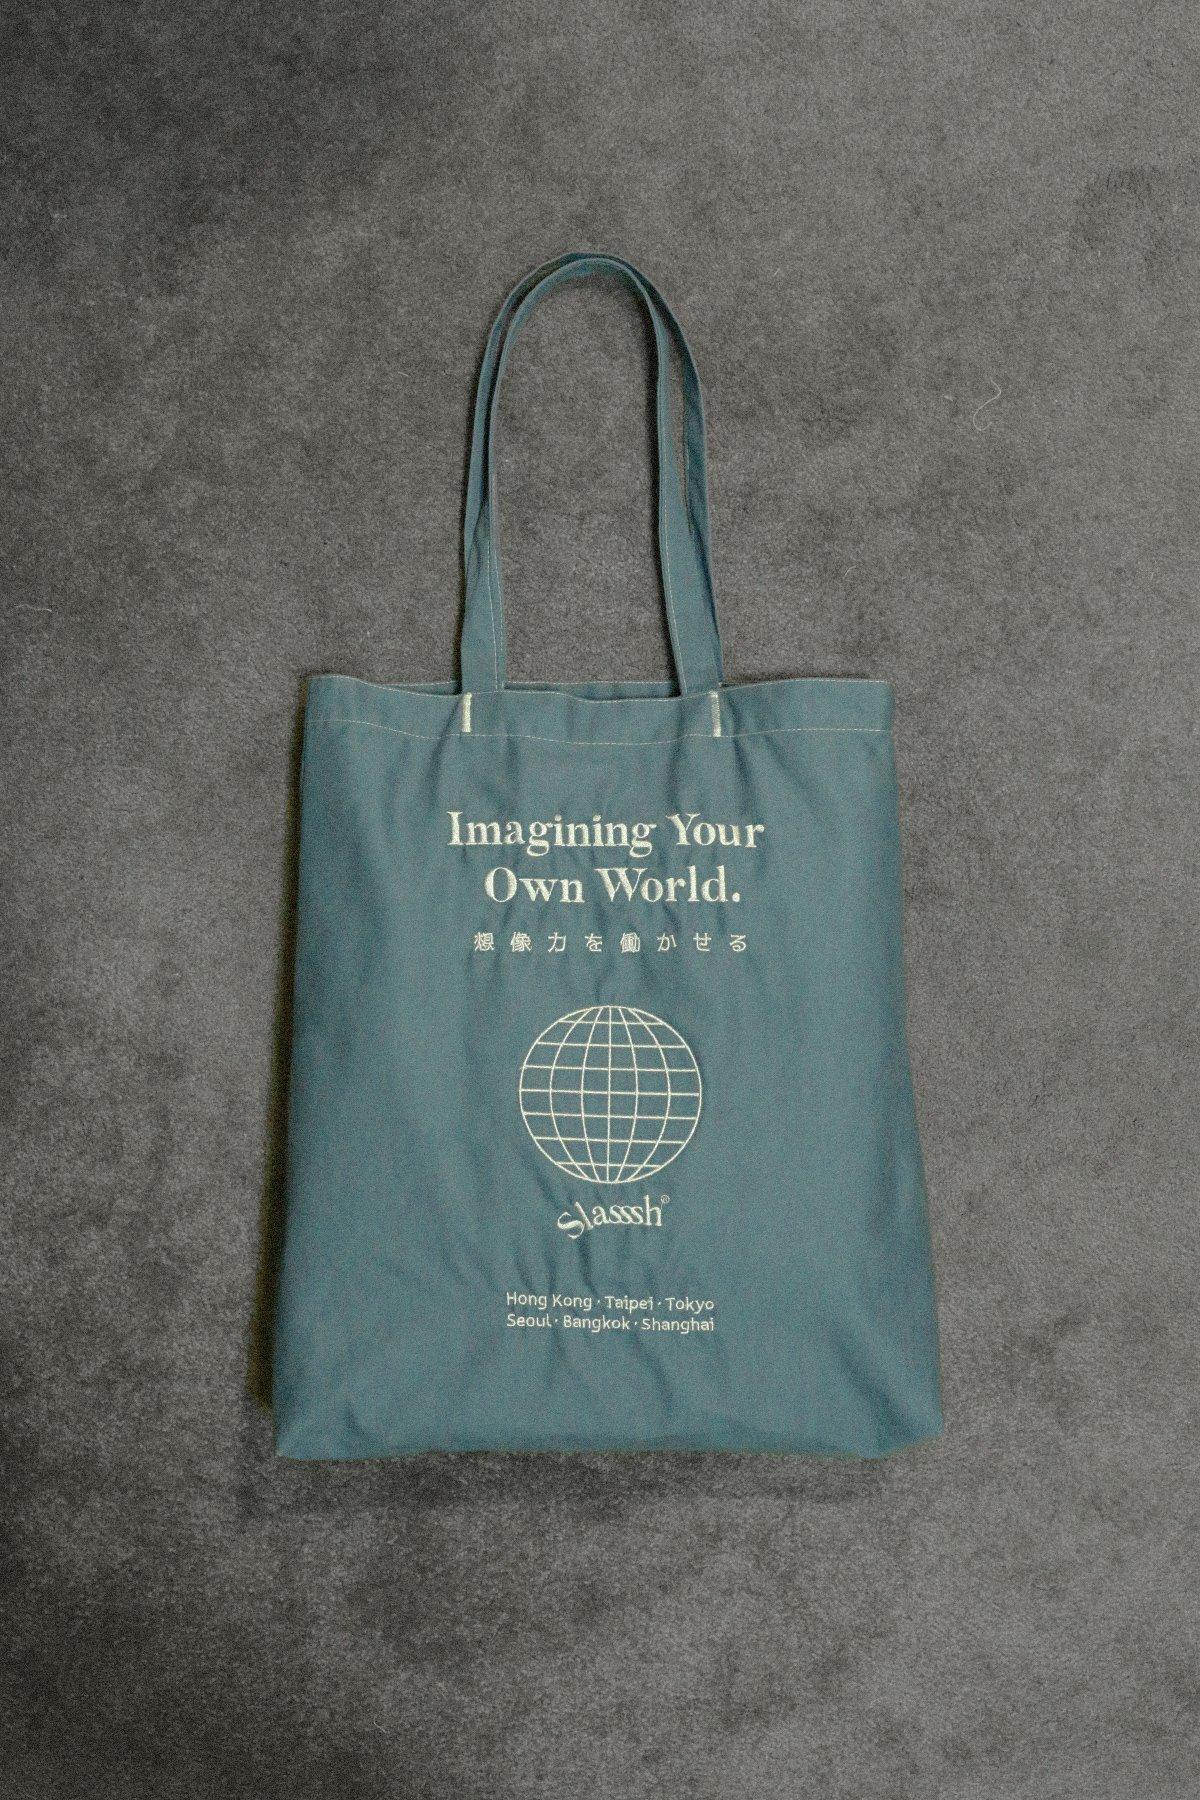 Image of Slasssh Imagine Your Own World Tote Bag